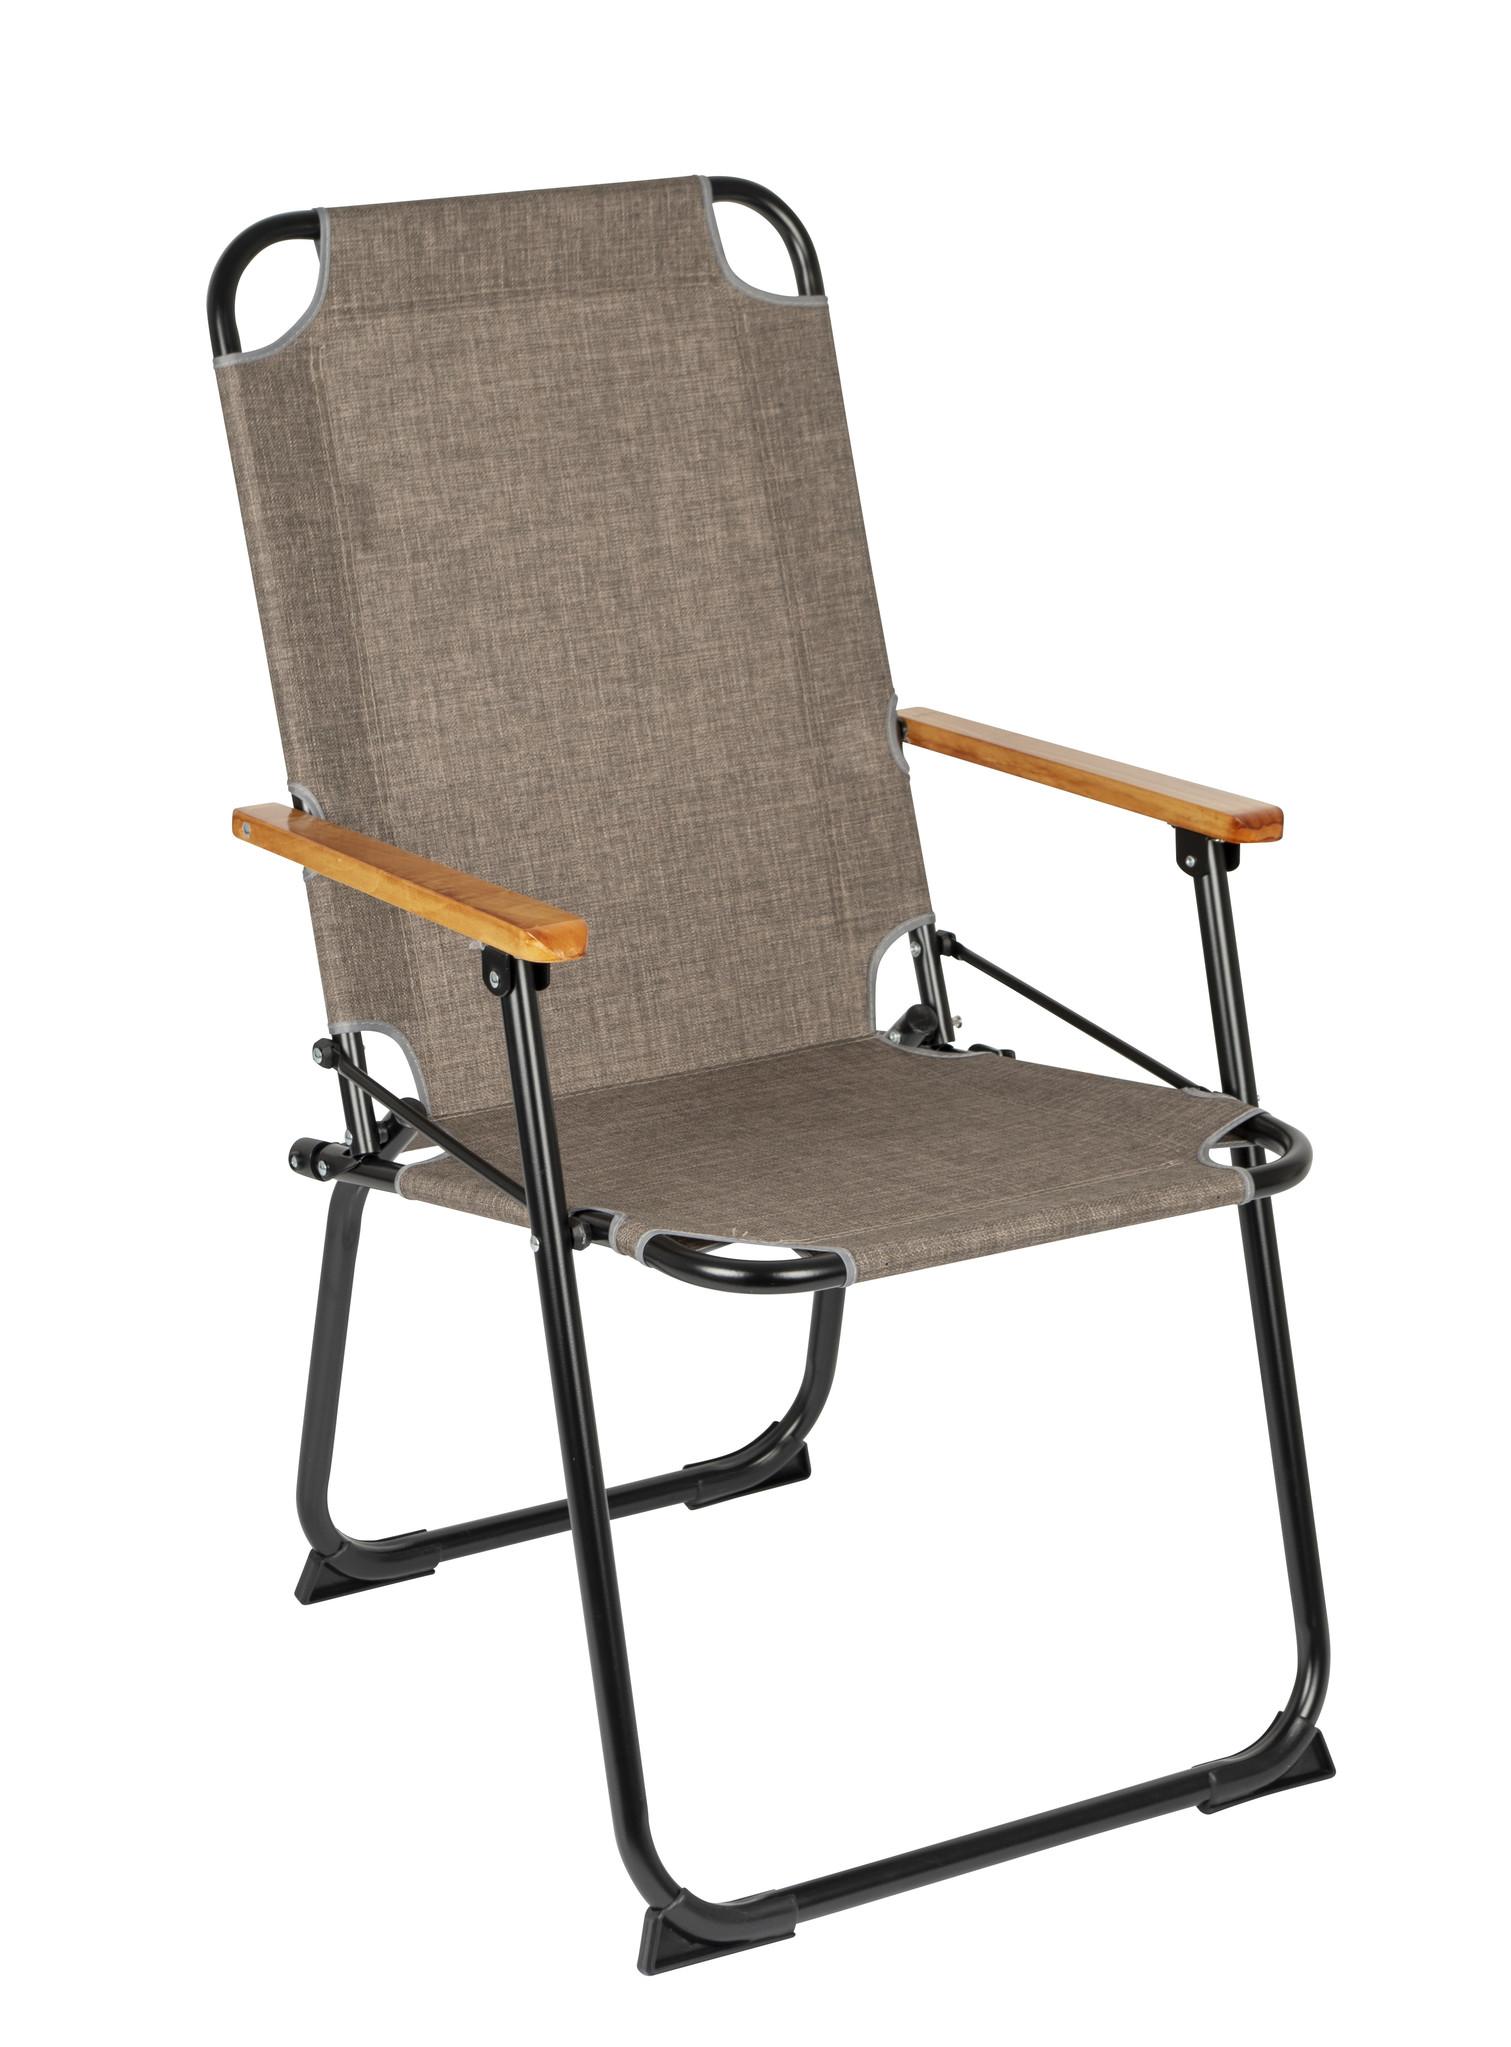 Bo Camp Brixton Folding Chair Bocamp Urban Collection